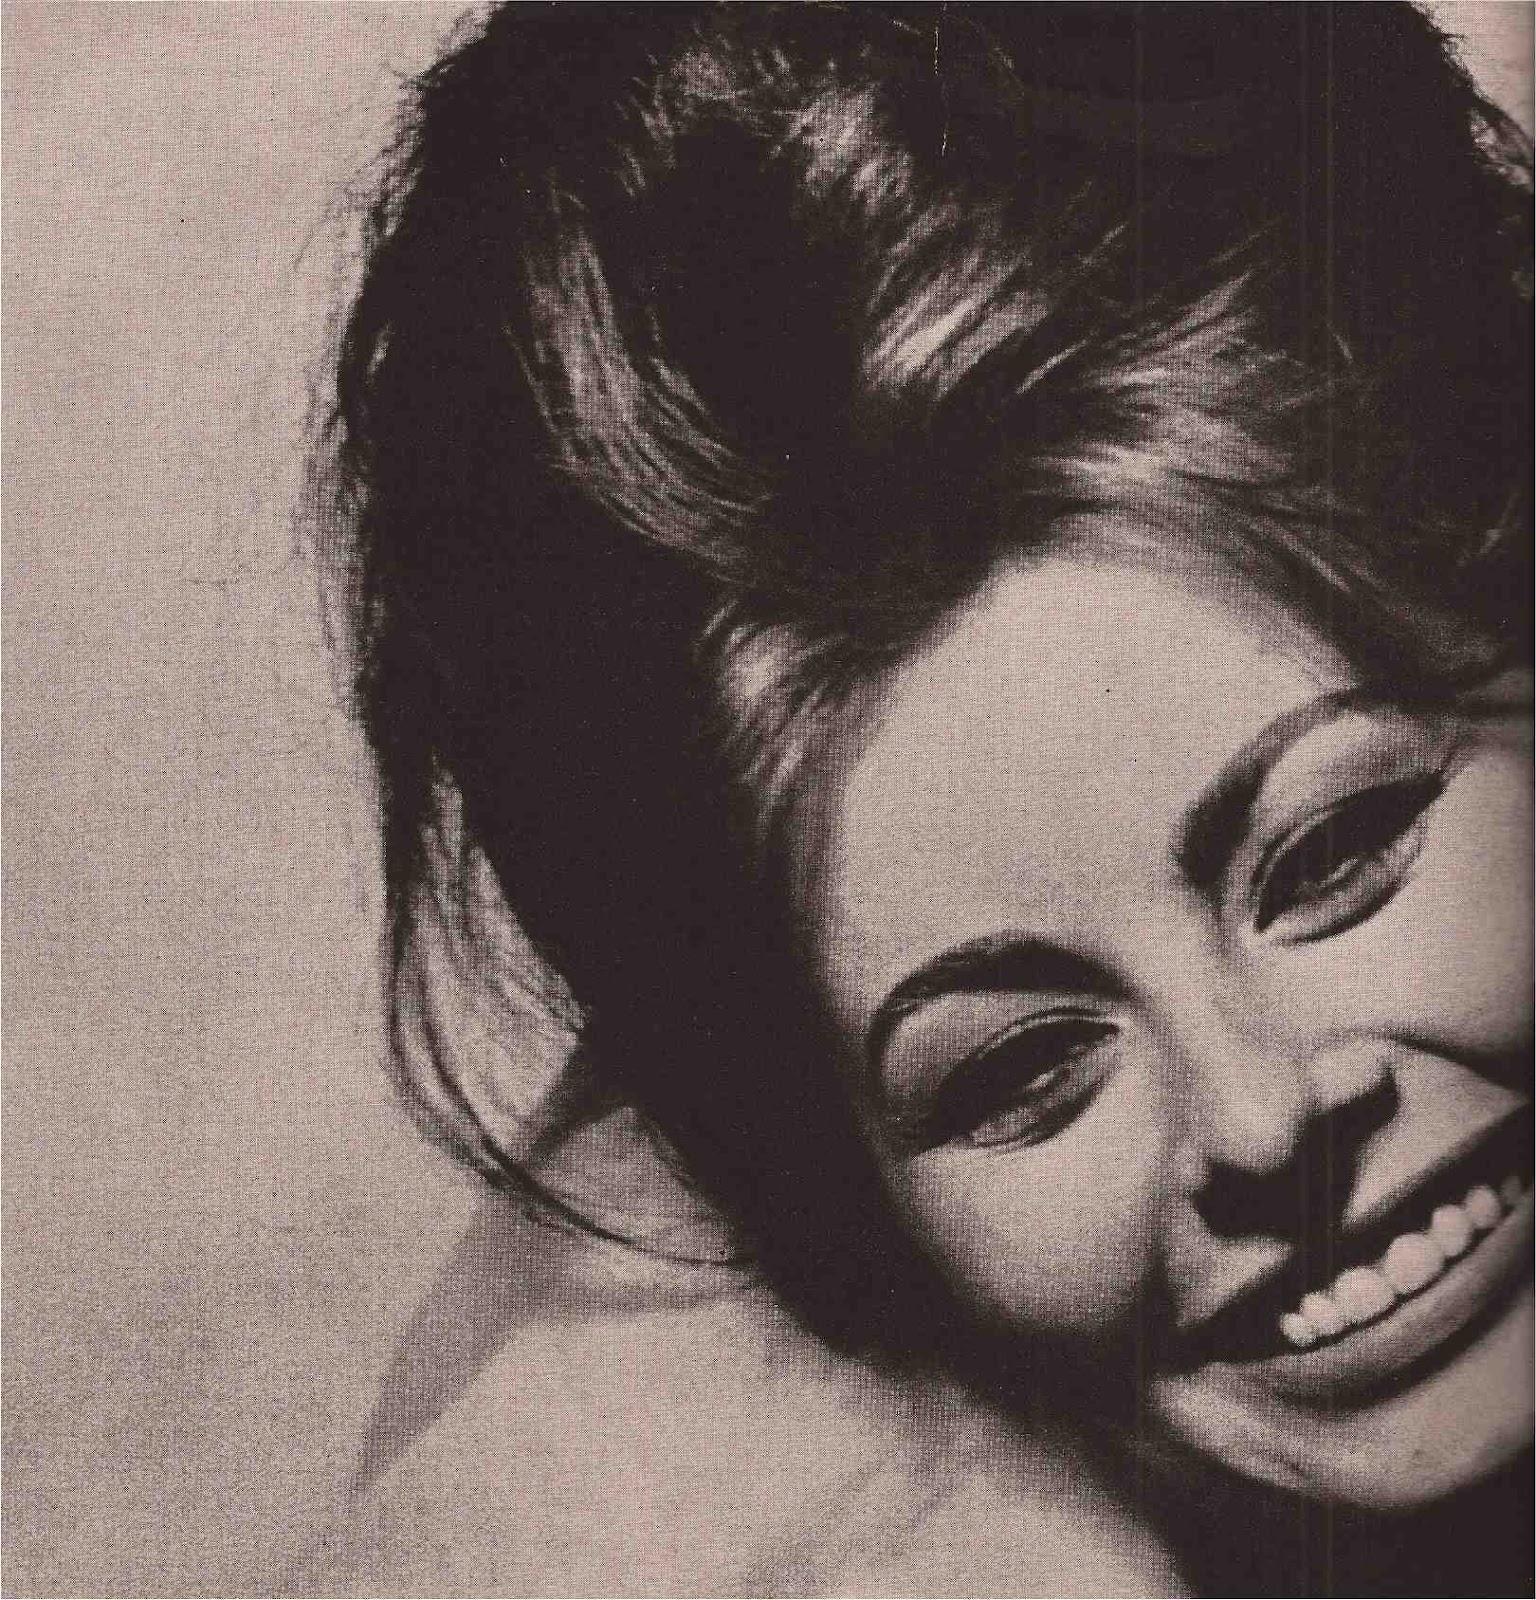 http://1.bp.blogspot.com/-x5BBREZCbMw/UDRqkoezXCI/AAAAAAAAHSY/8ExZC34xYlI/s1600/Sophia+Loren+Vogue+November+1962-1.jpg